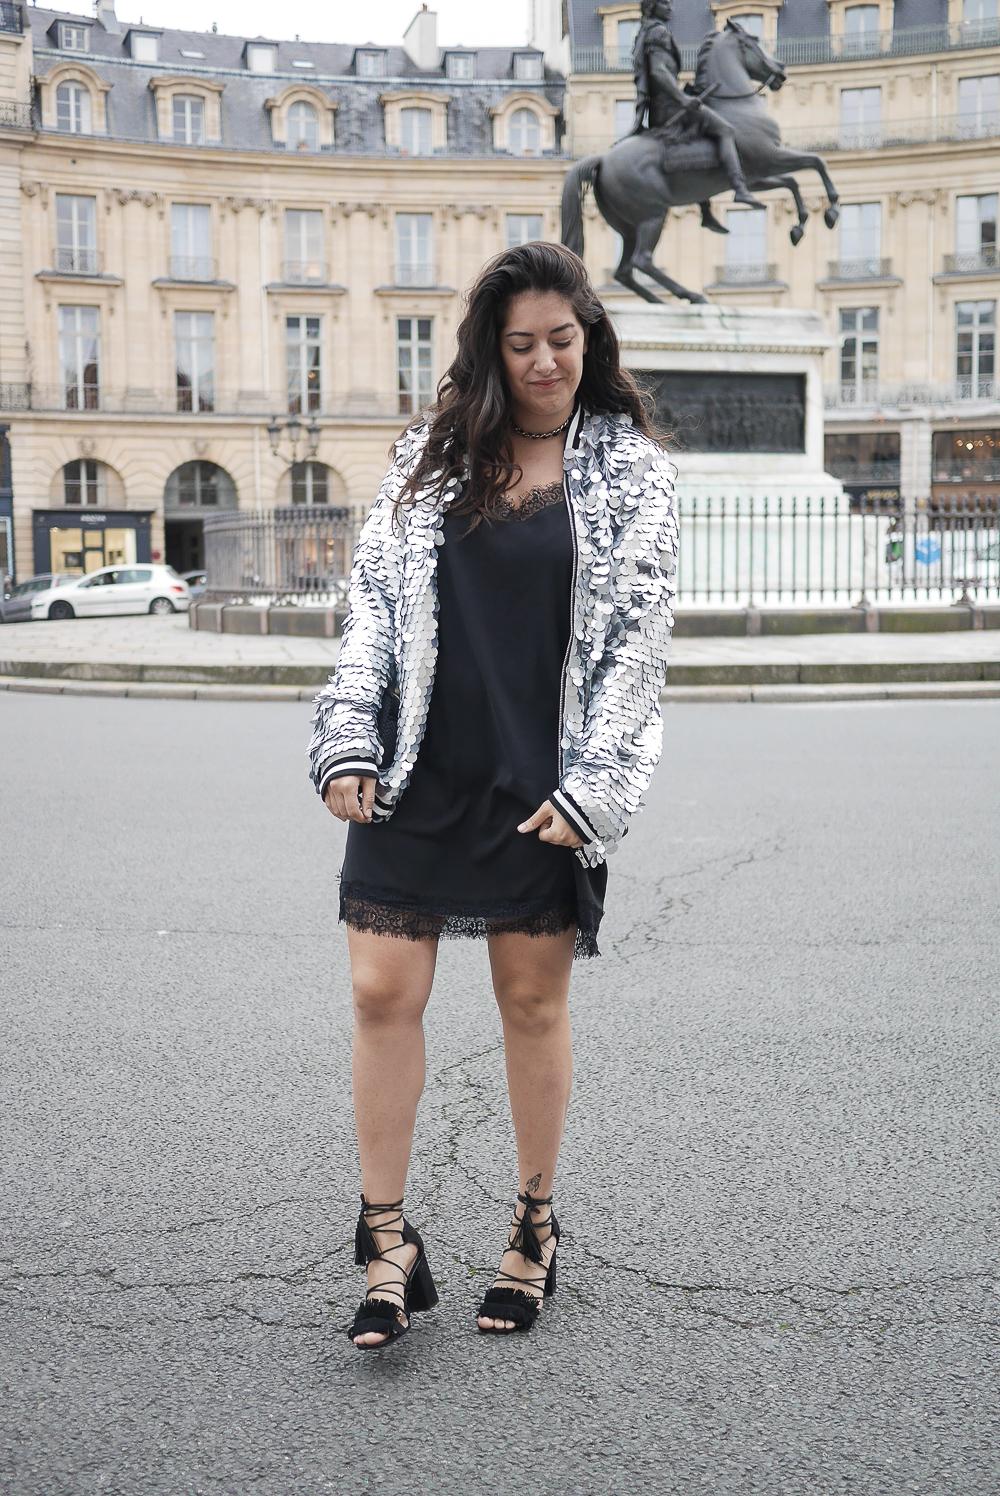 petite robe noire veste sequins asospetite robe noire veste sequins asos